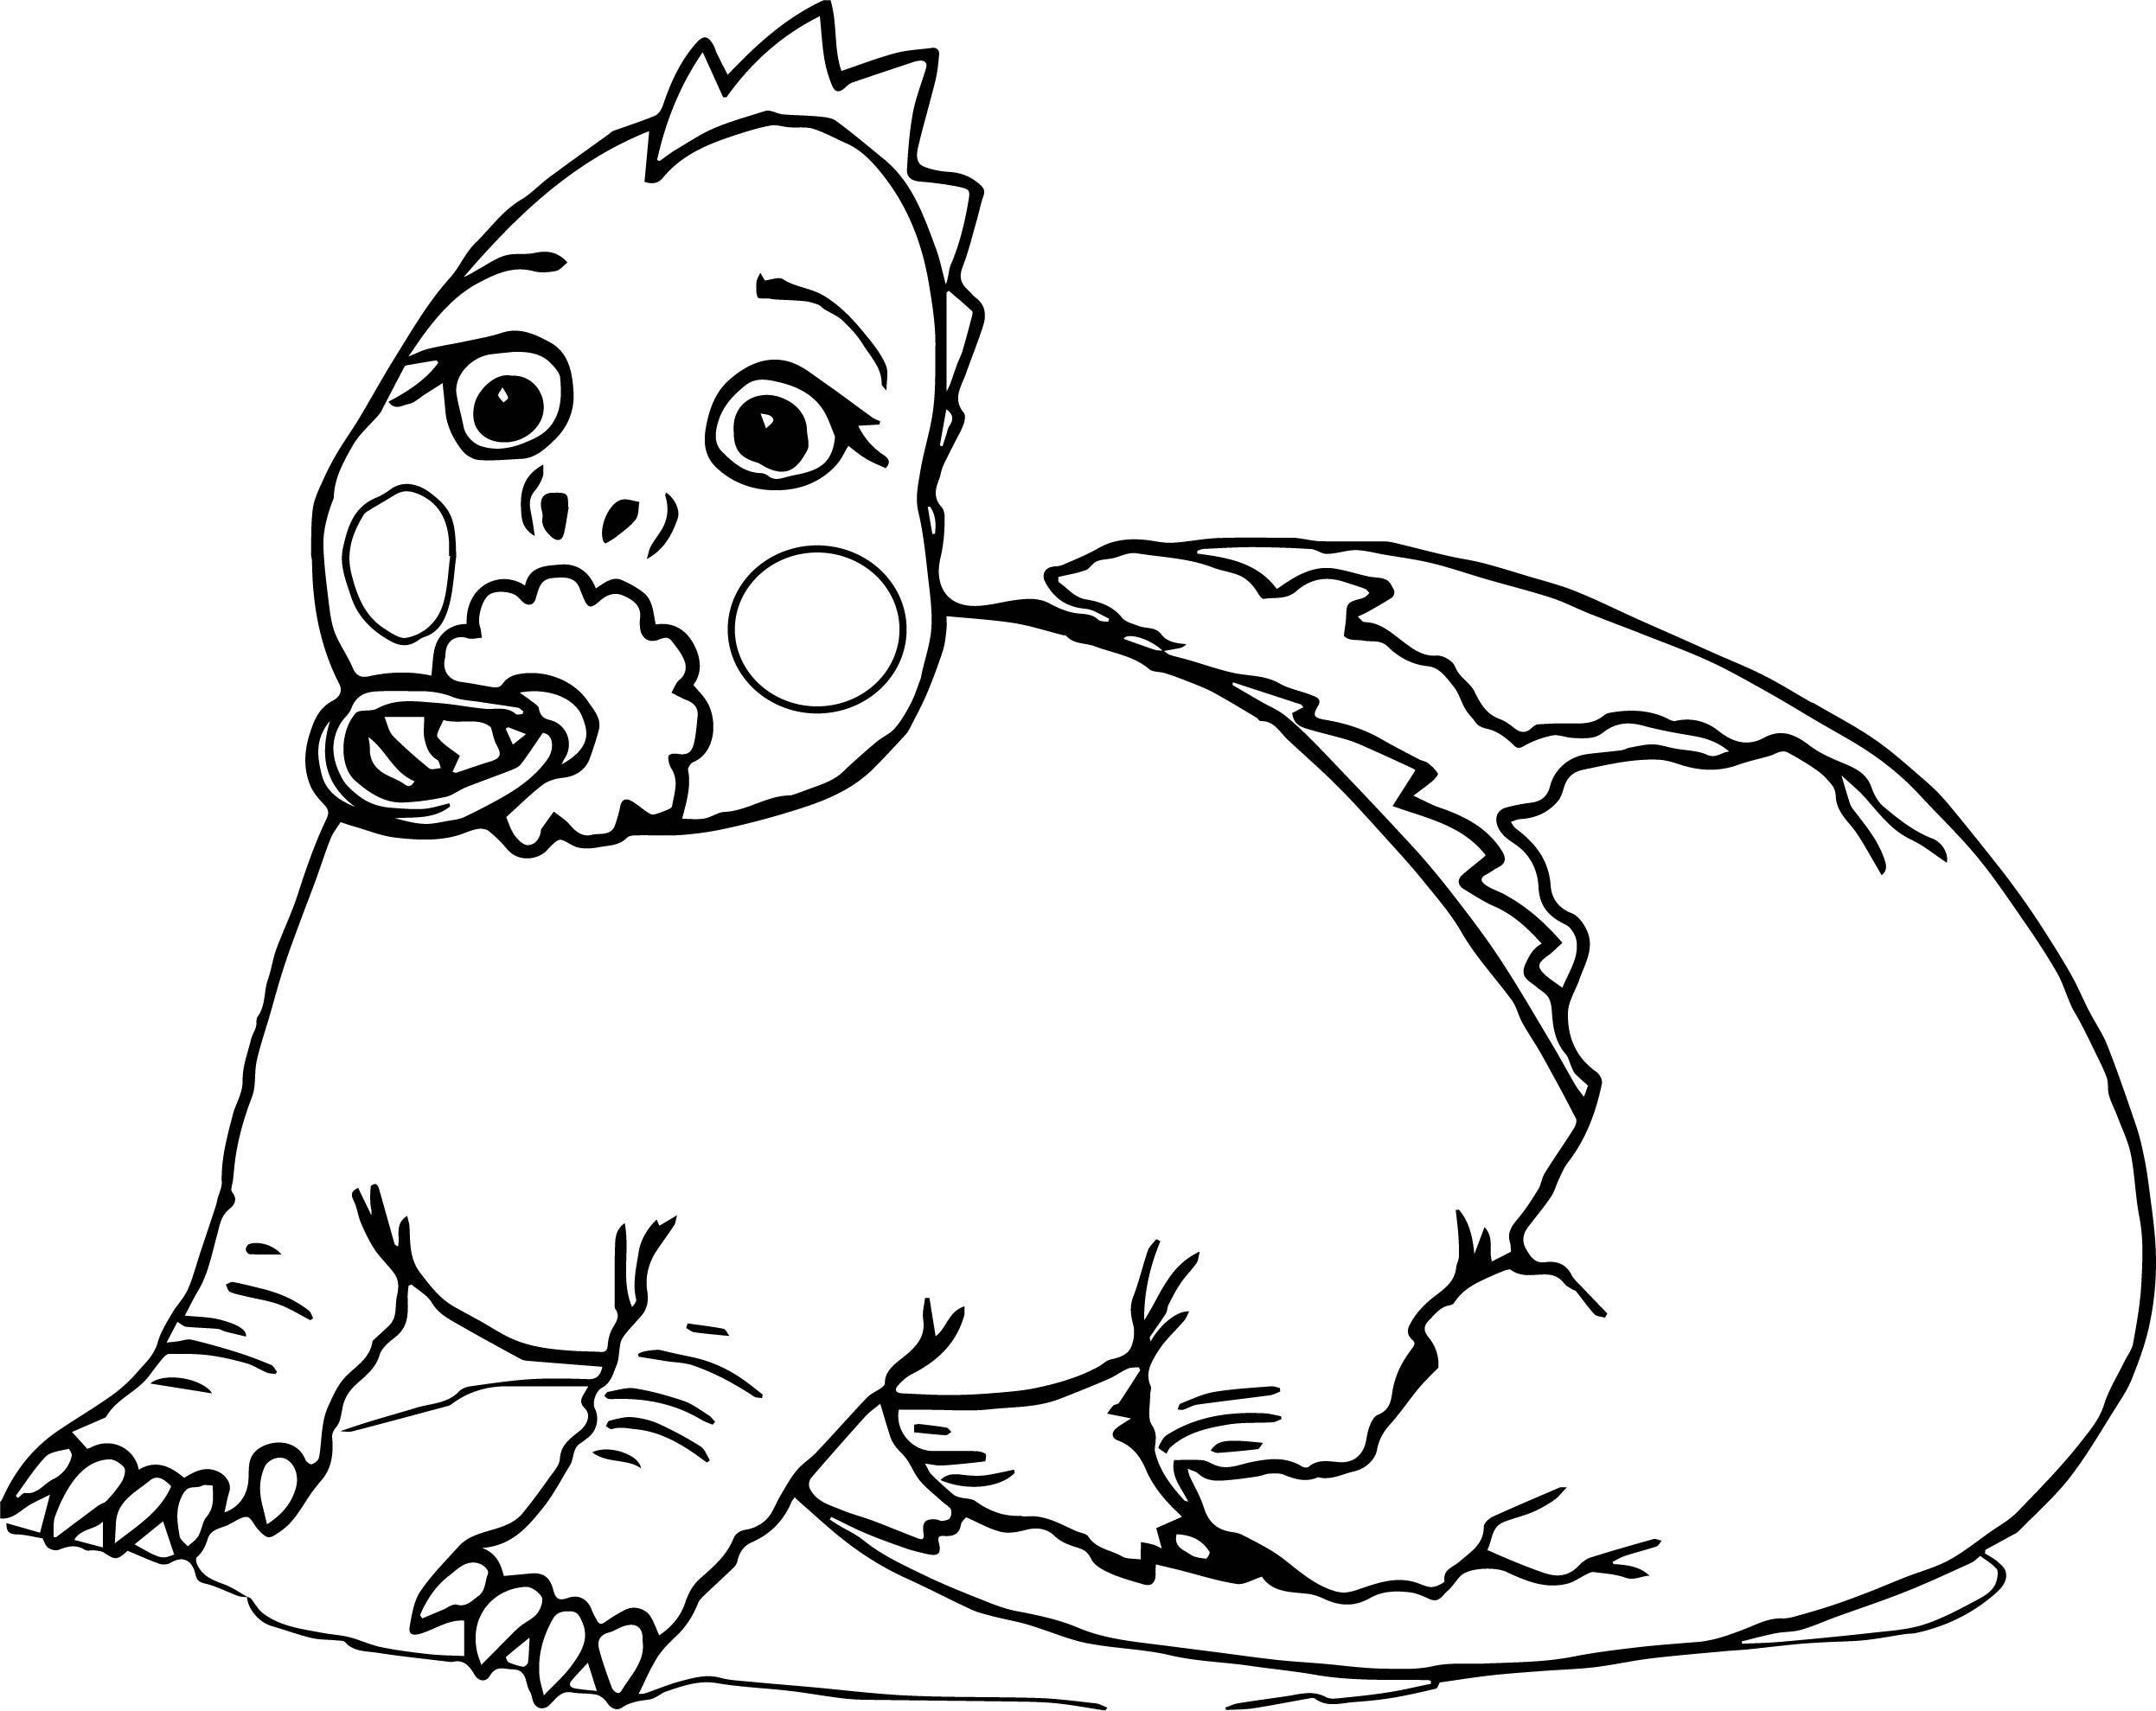 nice Baby Dinosaur Broken Egg Coloring Page Egg coloring